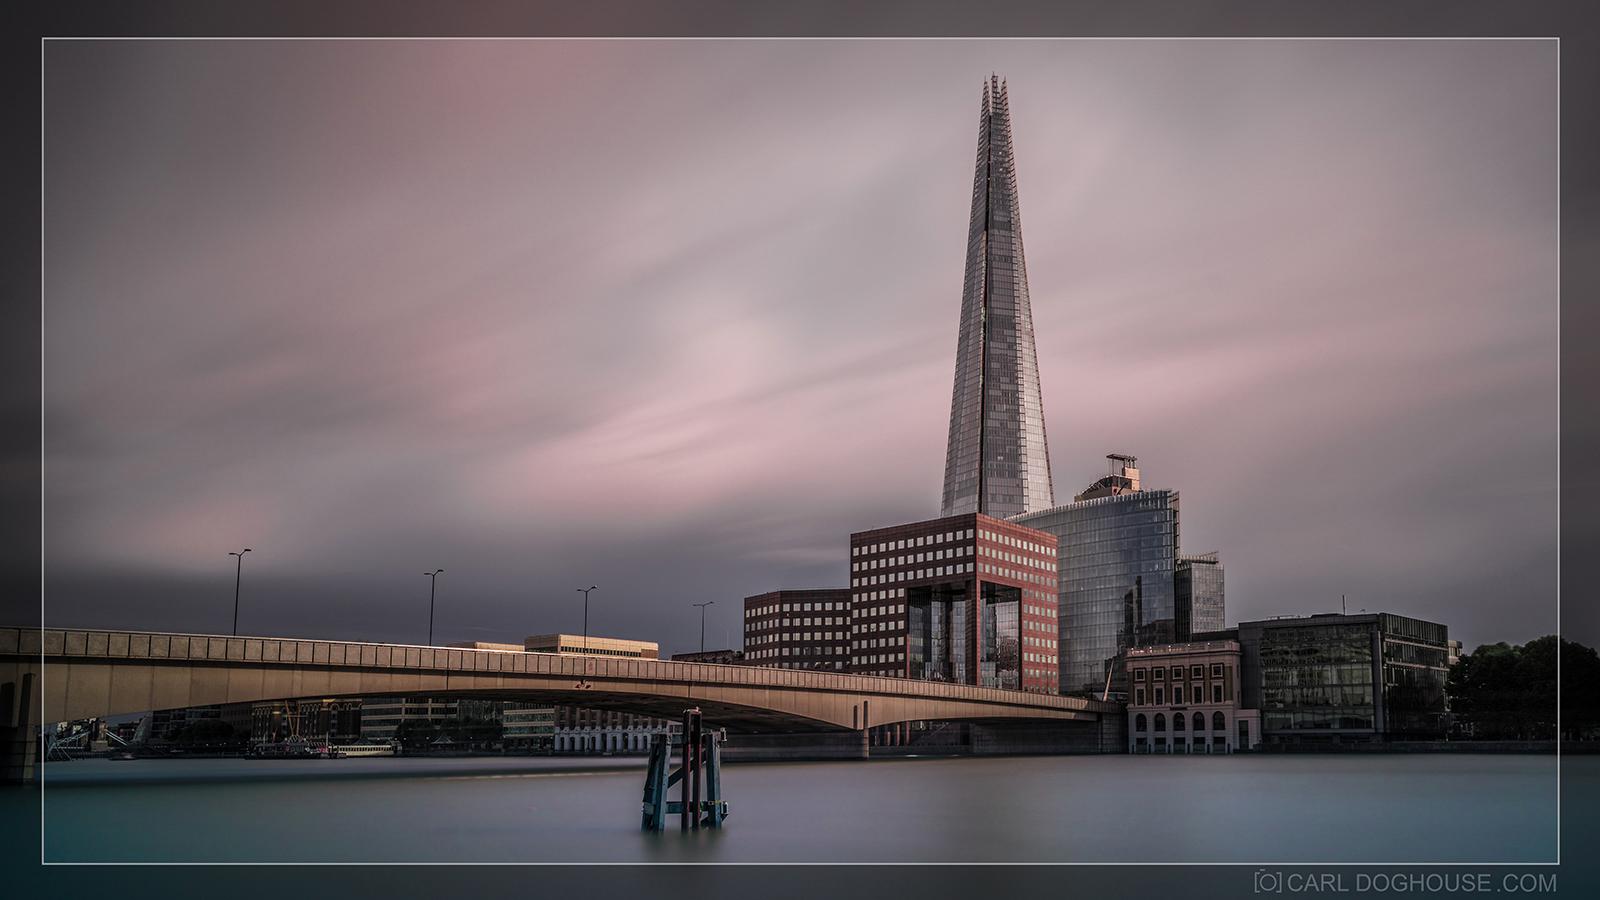 The Shard viewpoint, United Kingdom